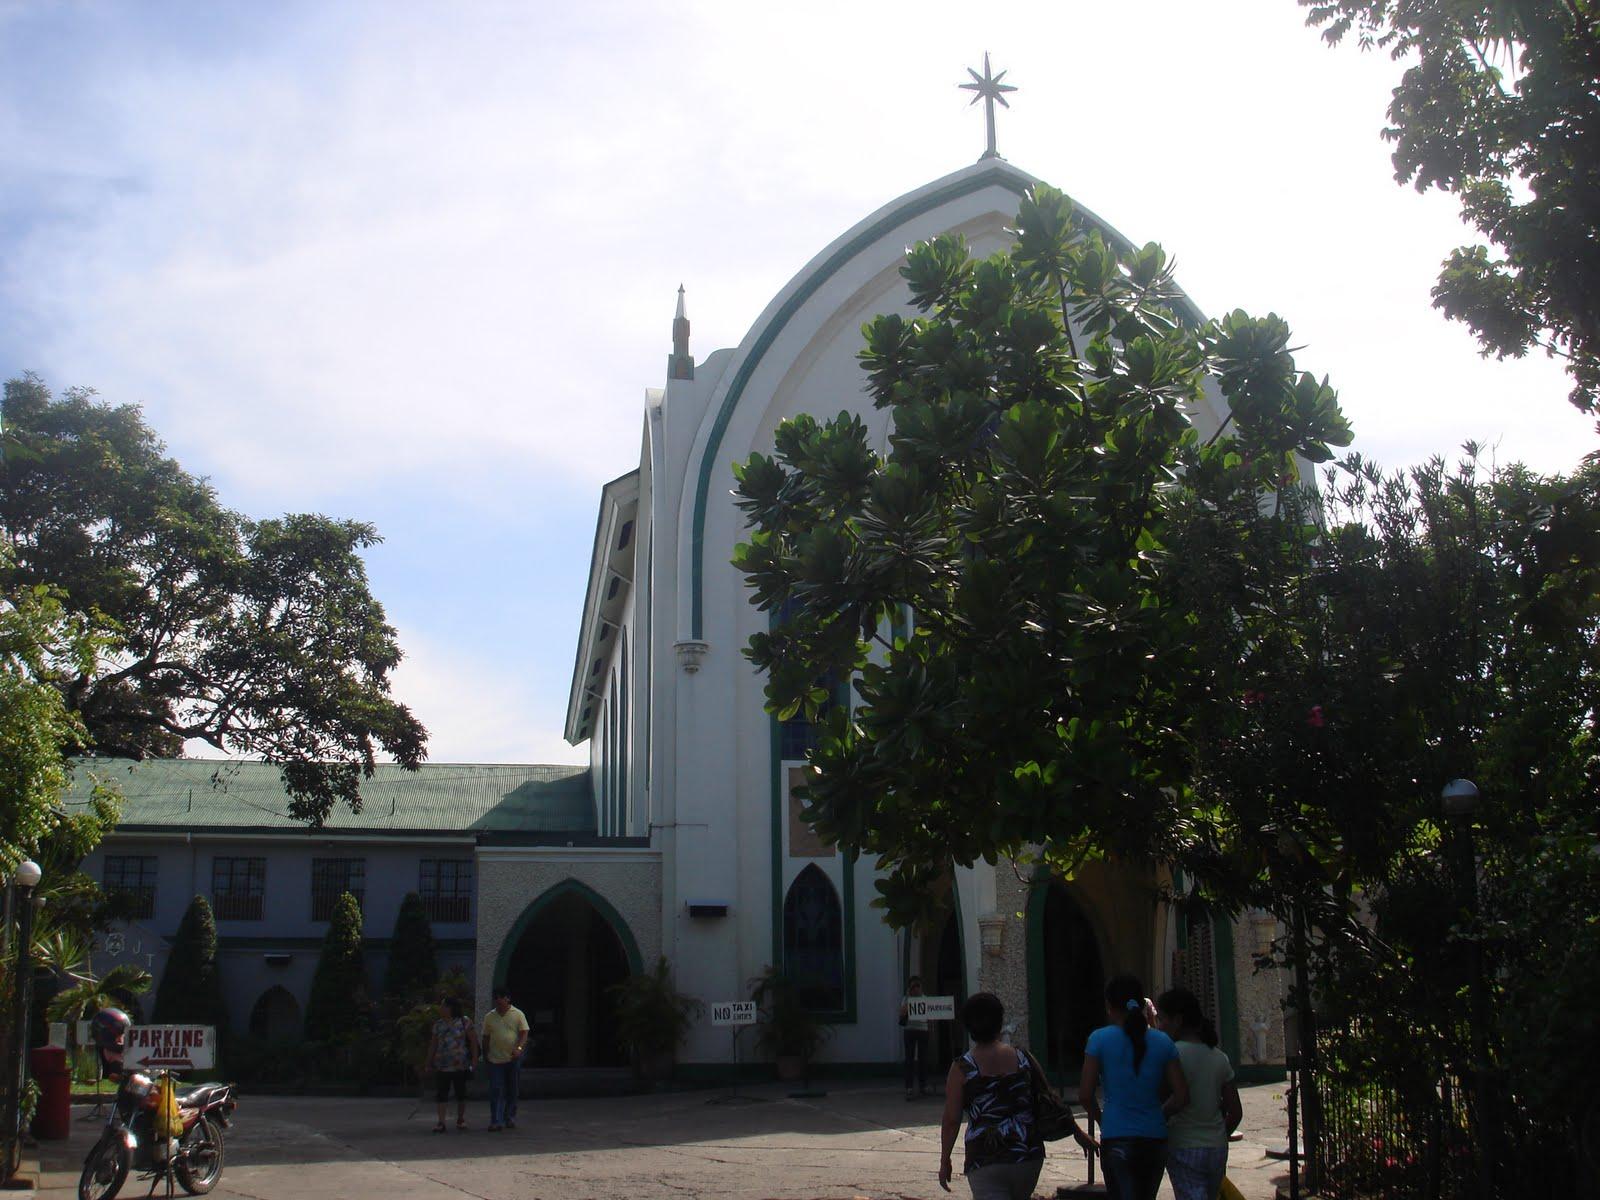 estoryahe bai - tanan CEBU ug BISDAK: Carmelite Monastery